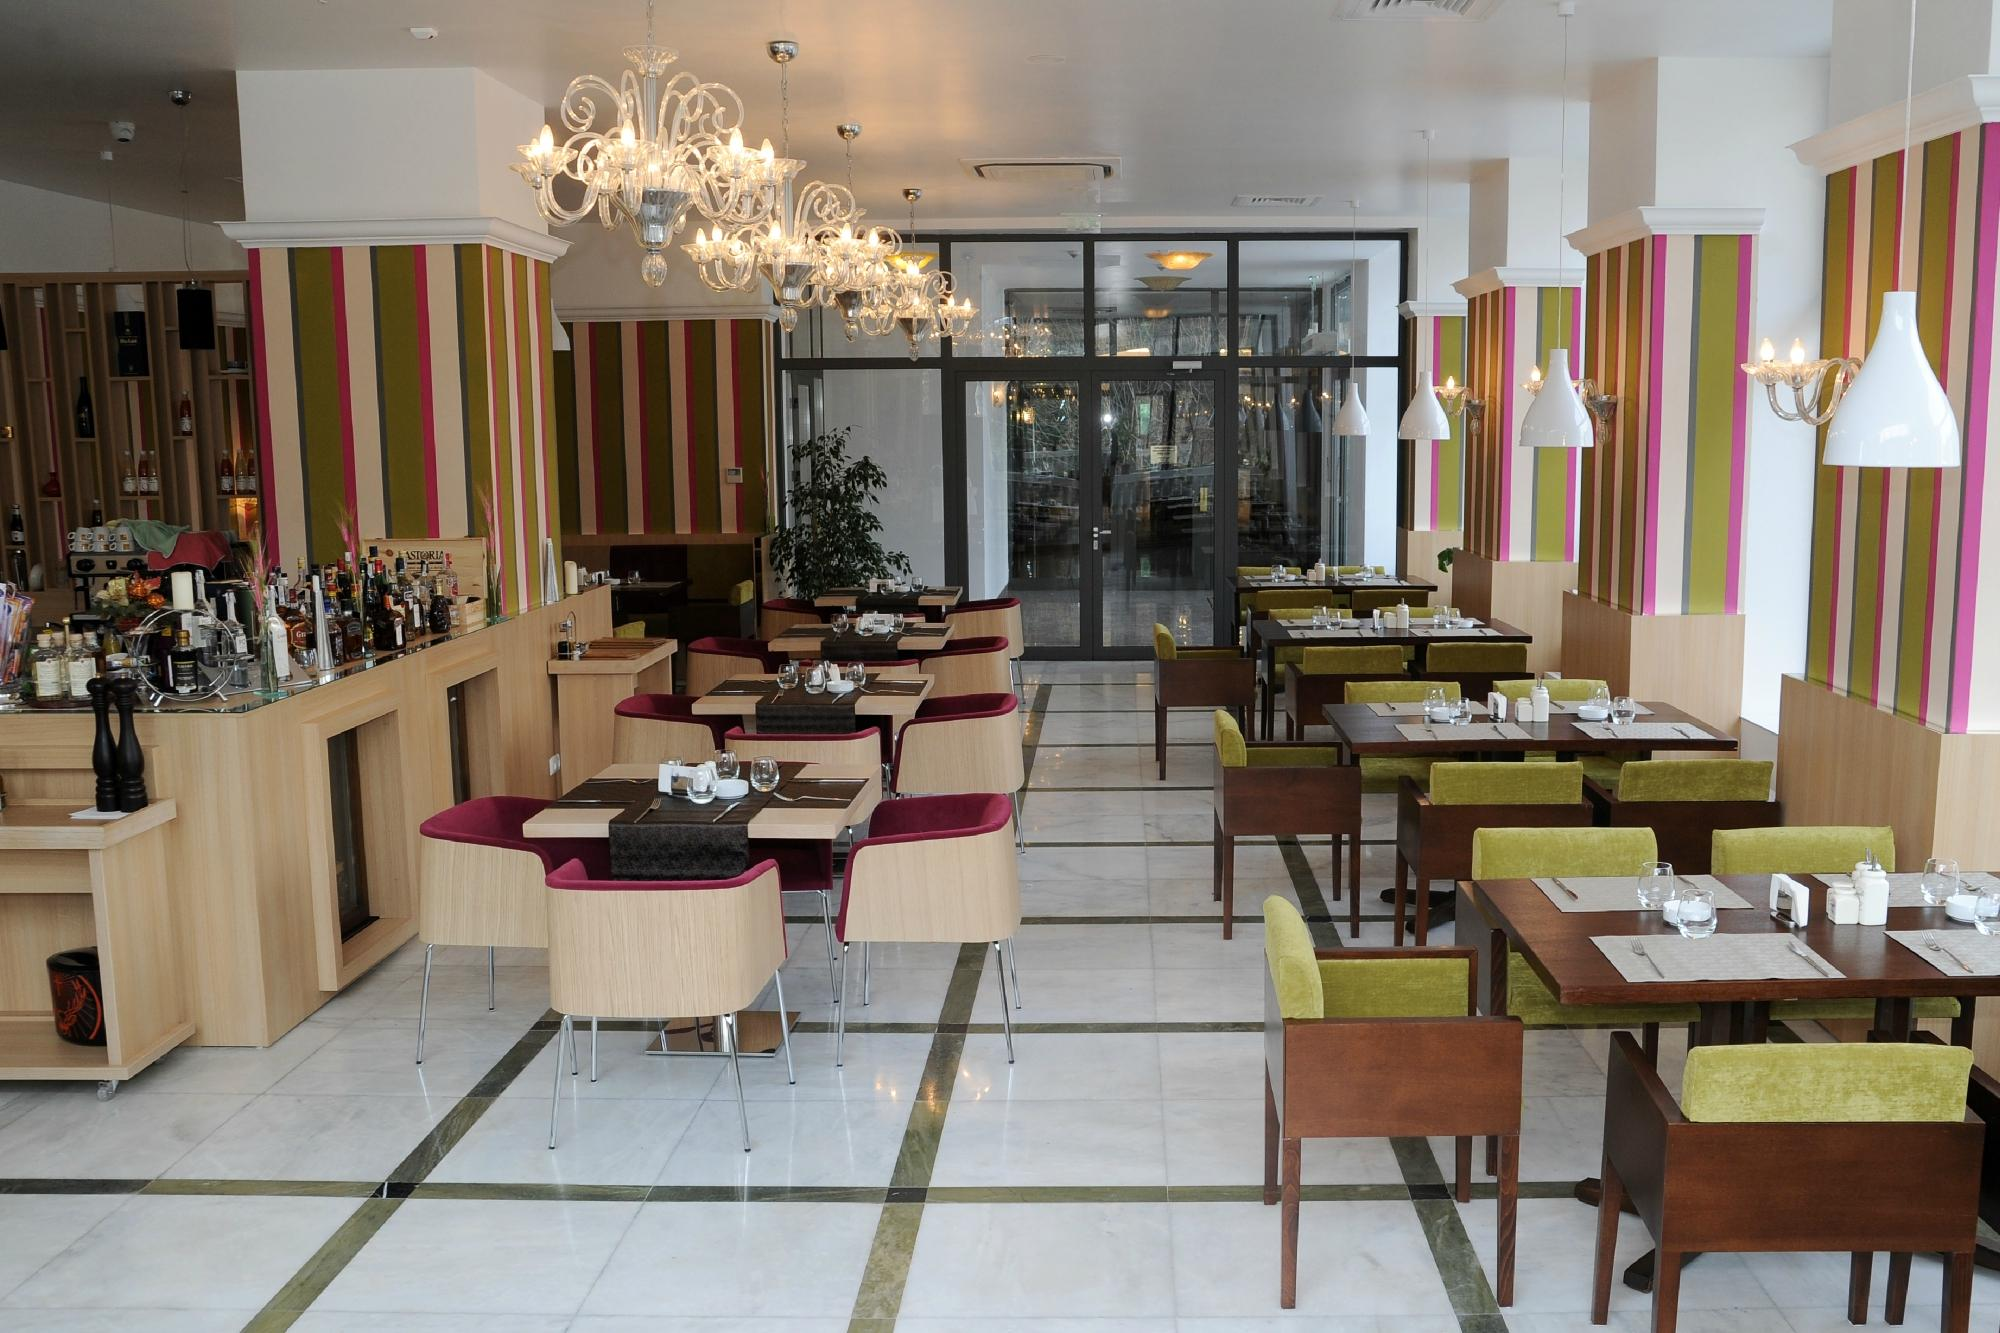 Things To Do in Romanian, Restaurants in Romanian